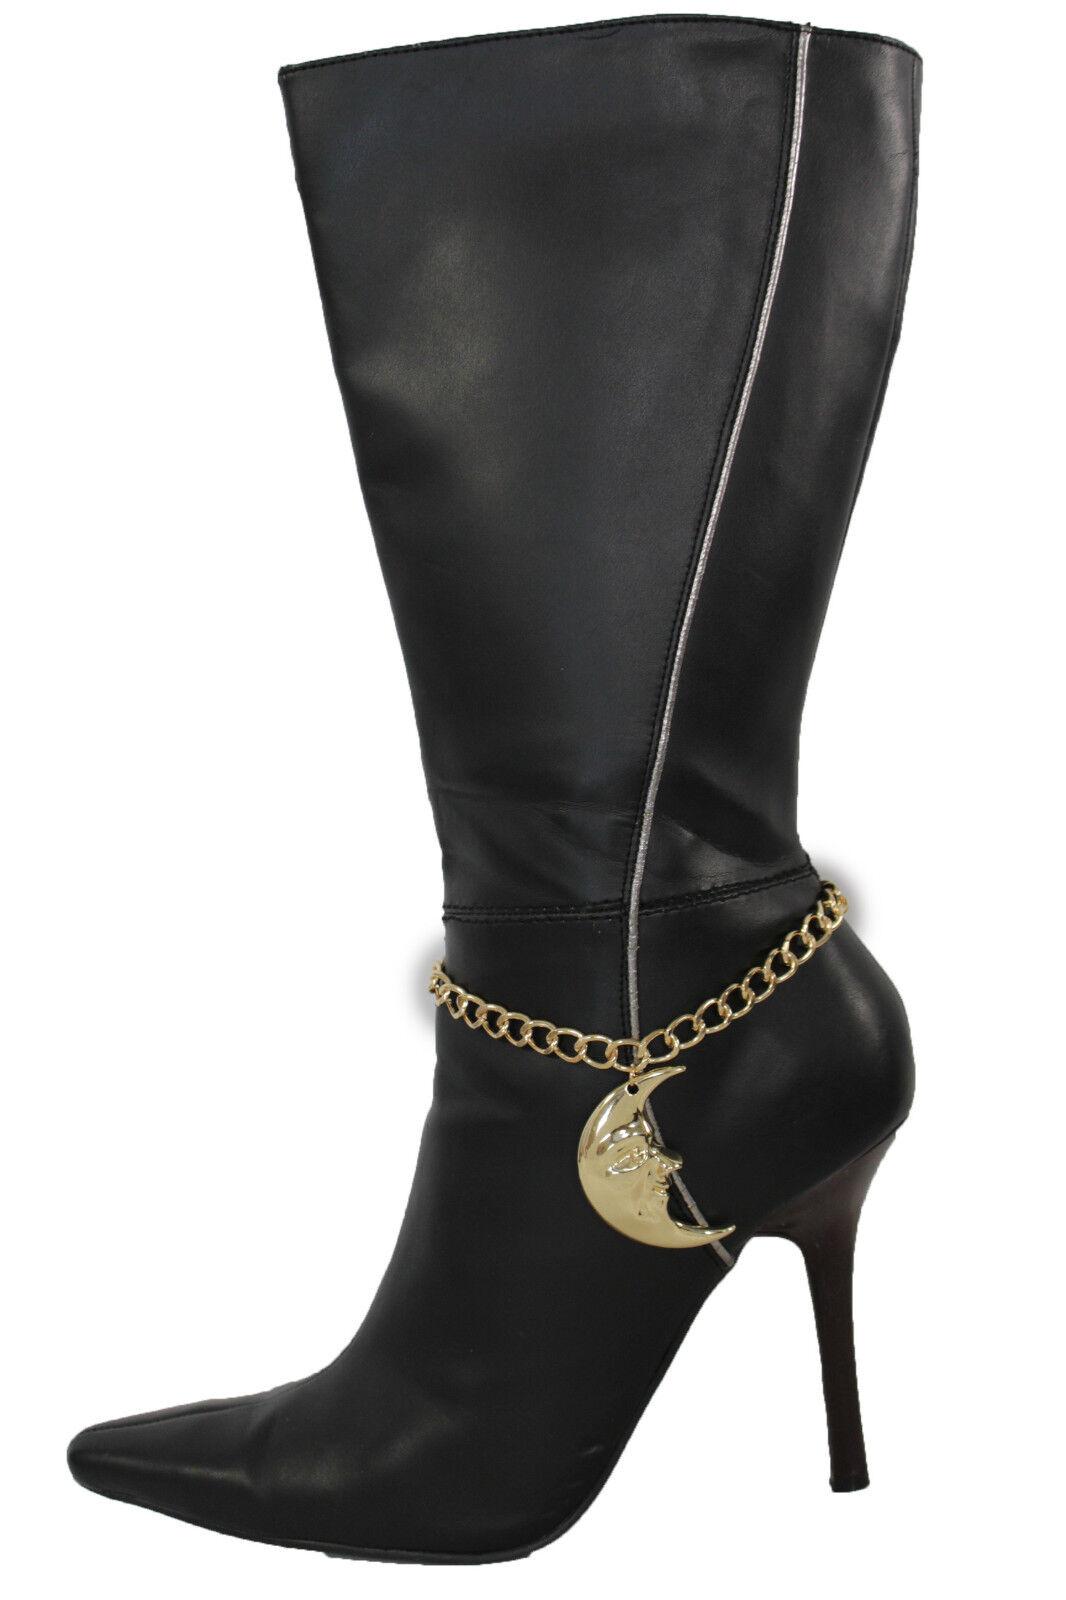 Fun Women Gold Metal Chain Boot Bracelet Shoe Shinny Moon Charm Jewelry Showgirl